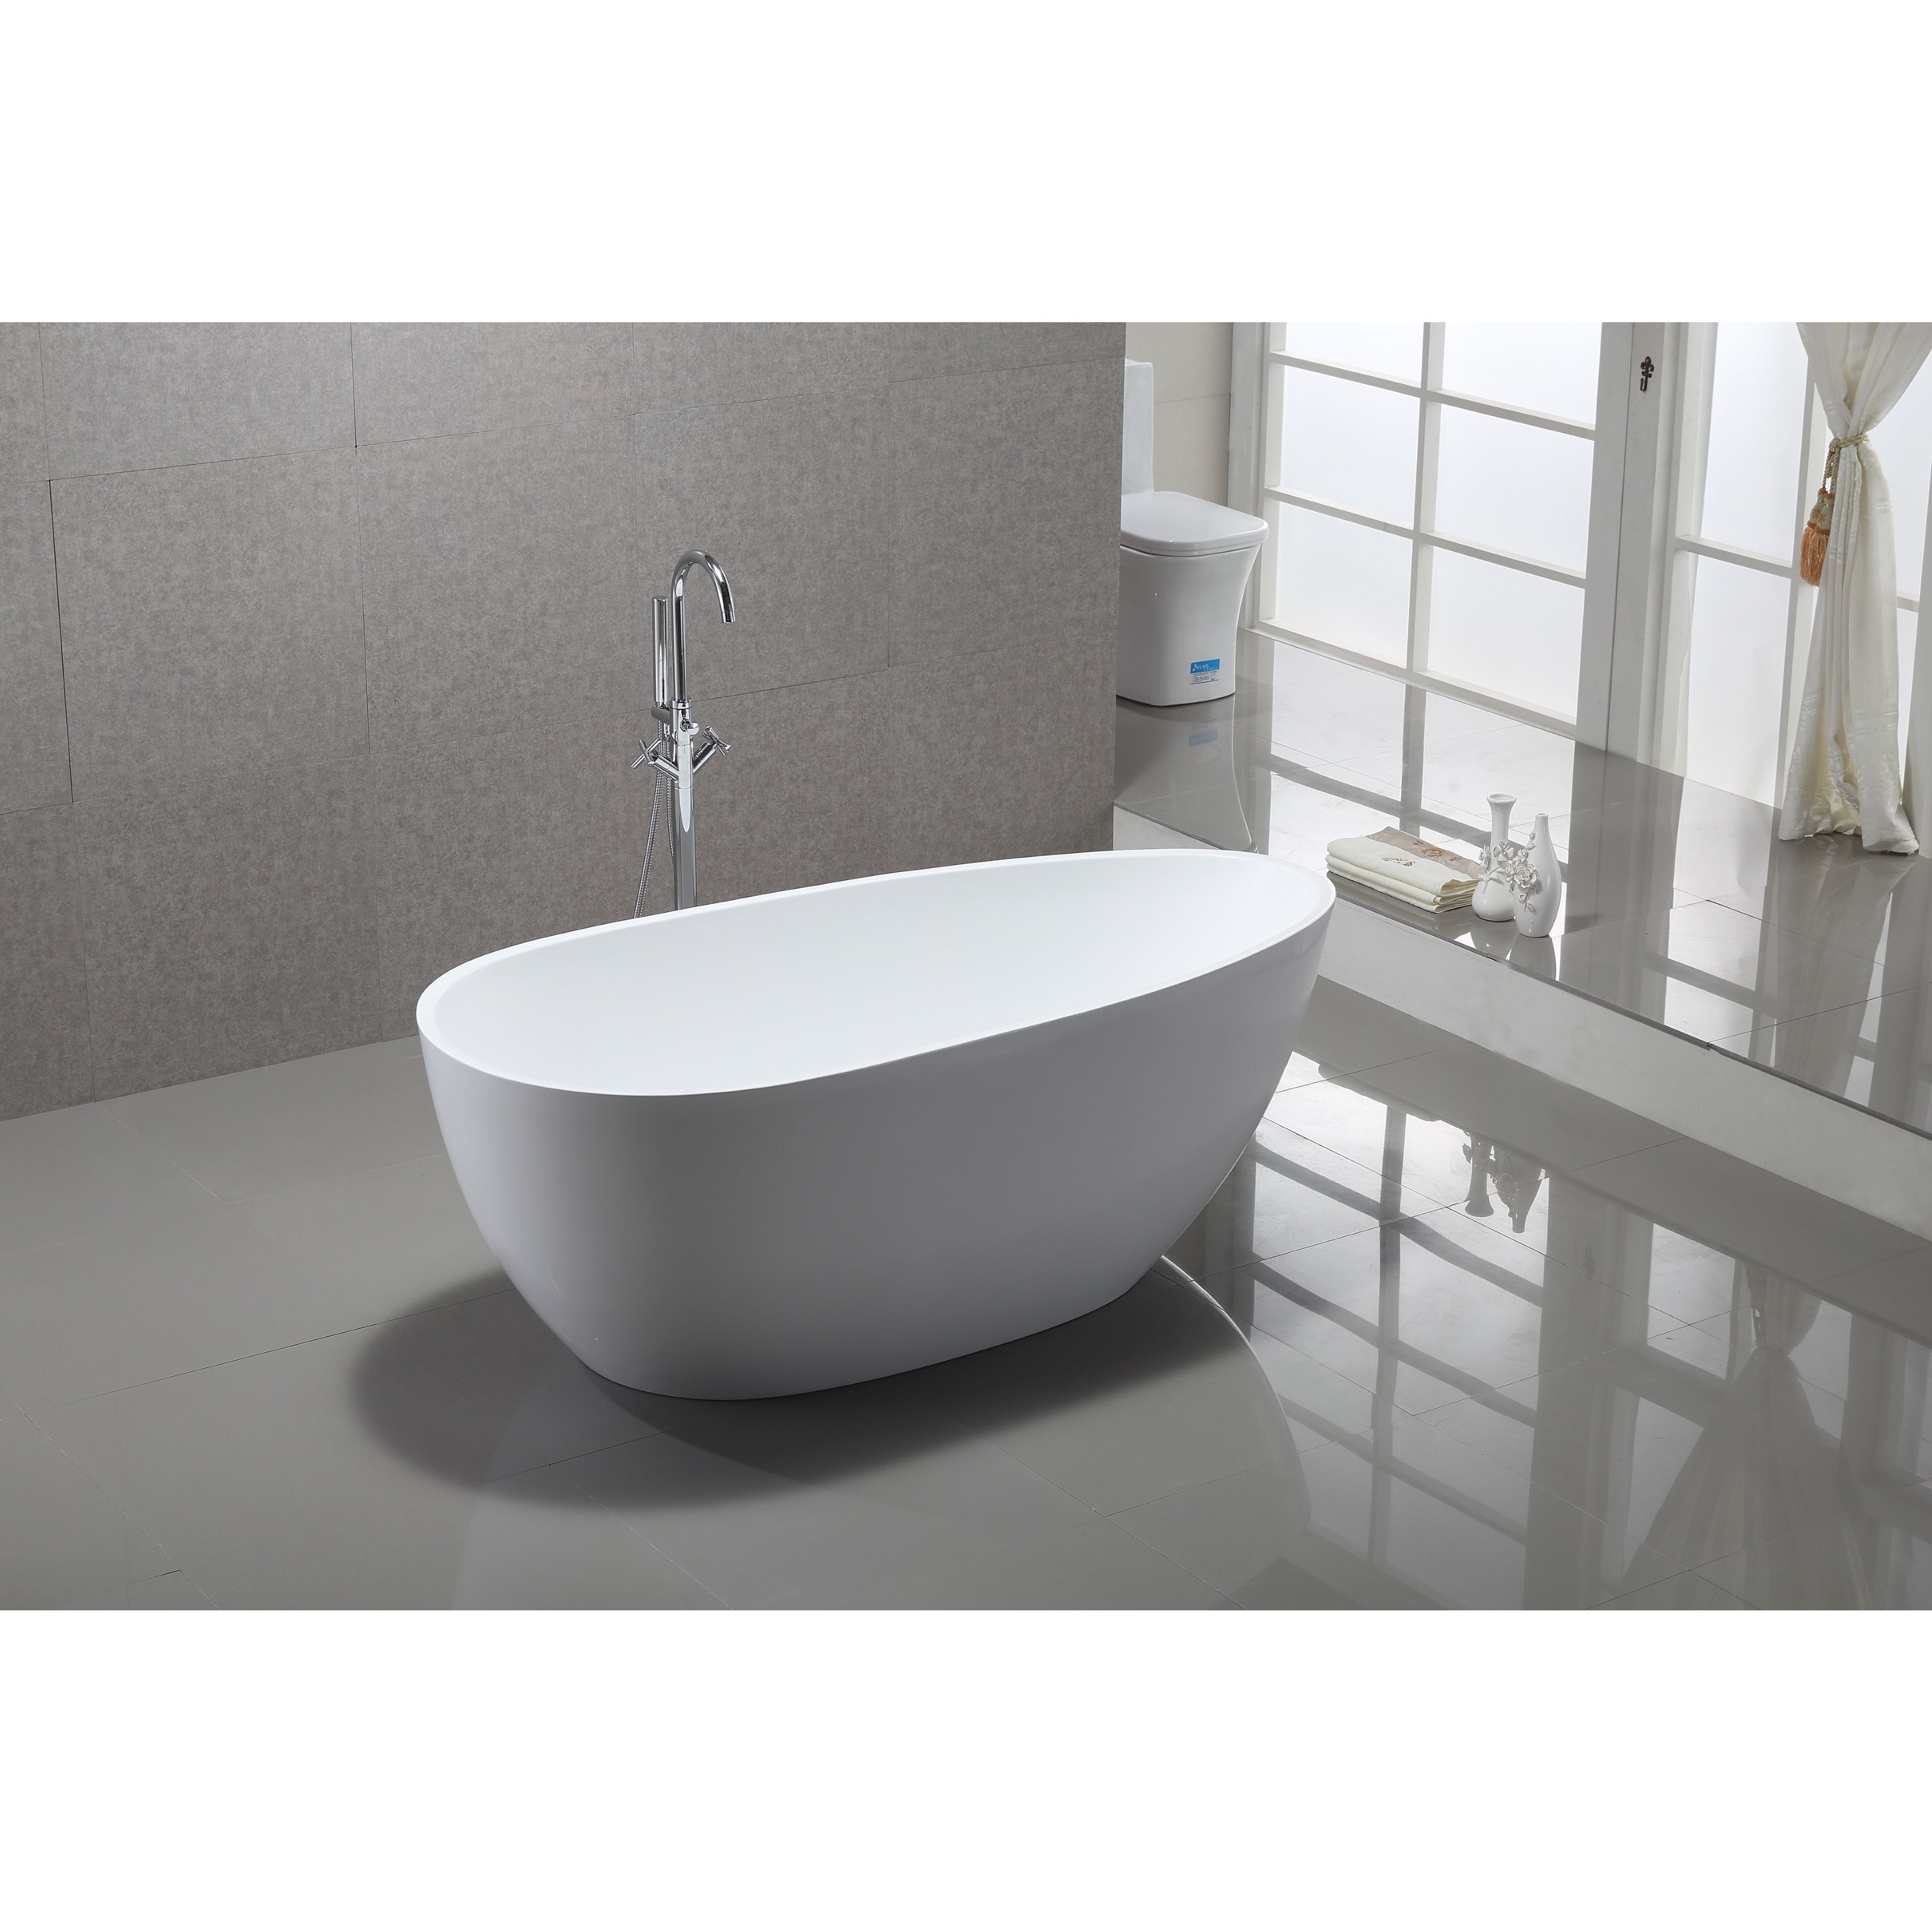 Vanity Art White Acrylic 59 Inch Freestanding Soaking Bathtub